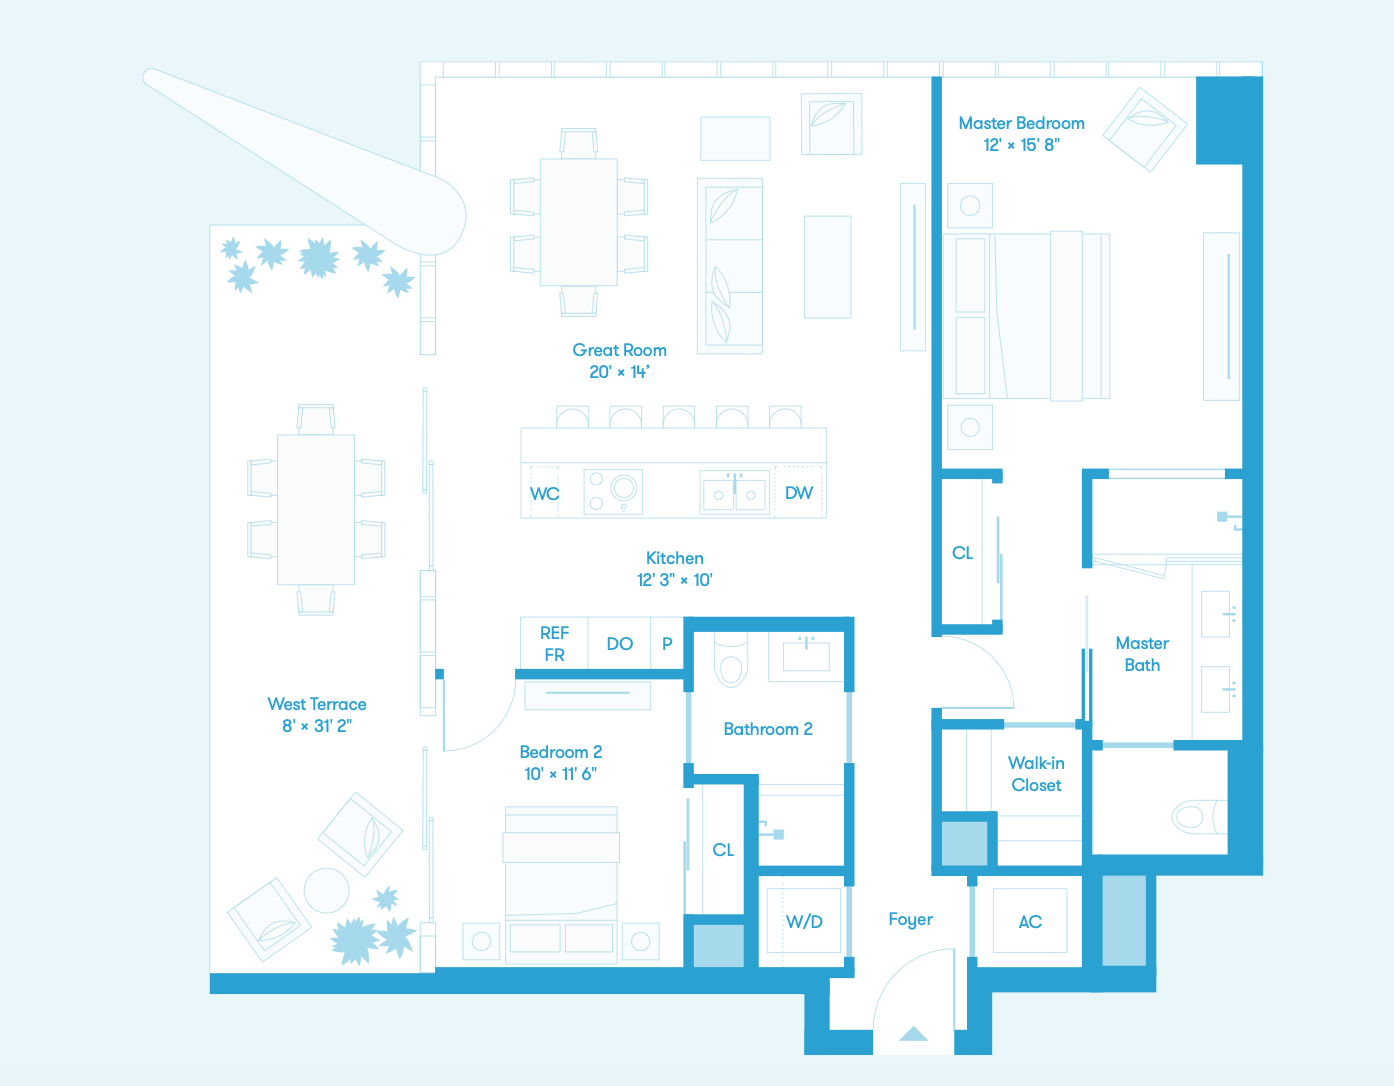 Tower Residence NW Floors 38 - 56